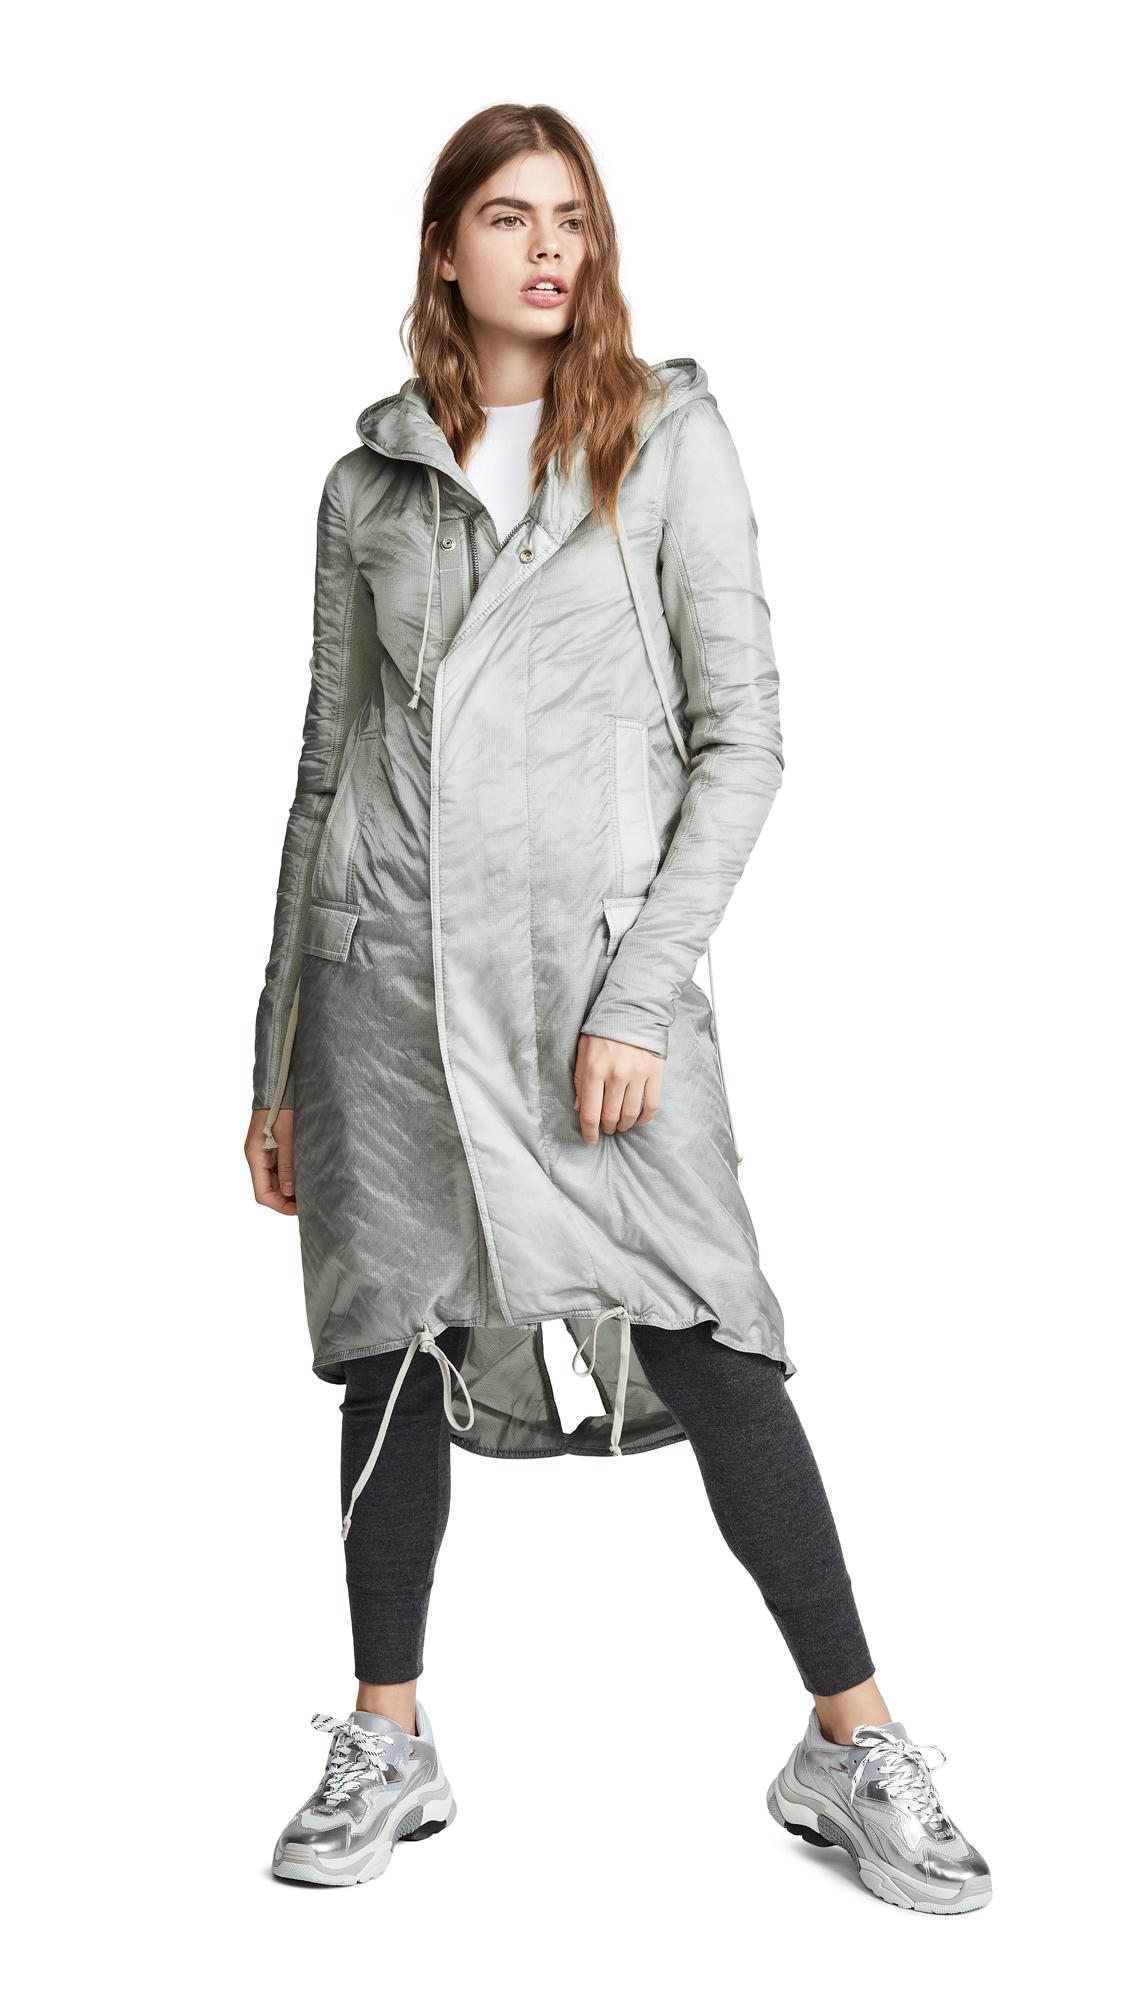 Rick Owens DRKSHDW Fishtail Long Jacket